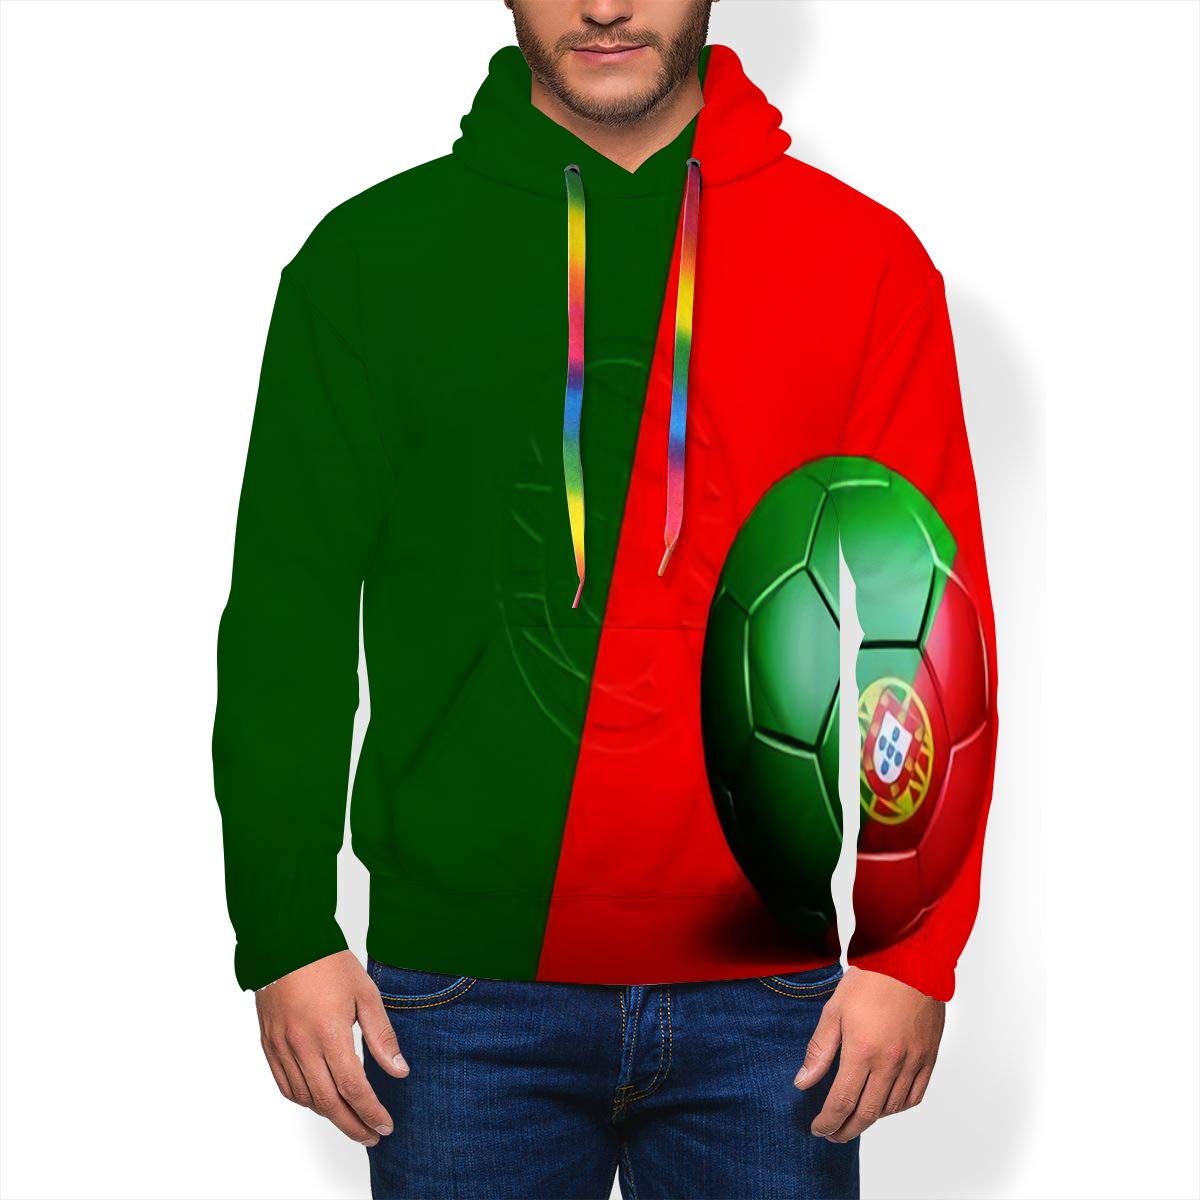 Randell Hoodie Sweatshirt Athletic Roots Rock Reggae Quote Rastafarian Flag Grunge Pullover Sweatshirt Pockets